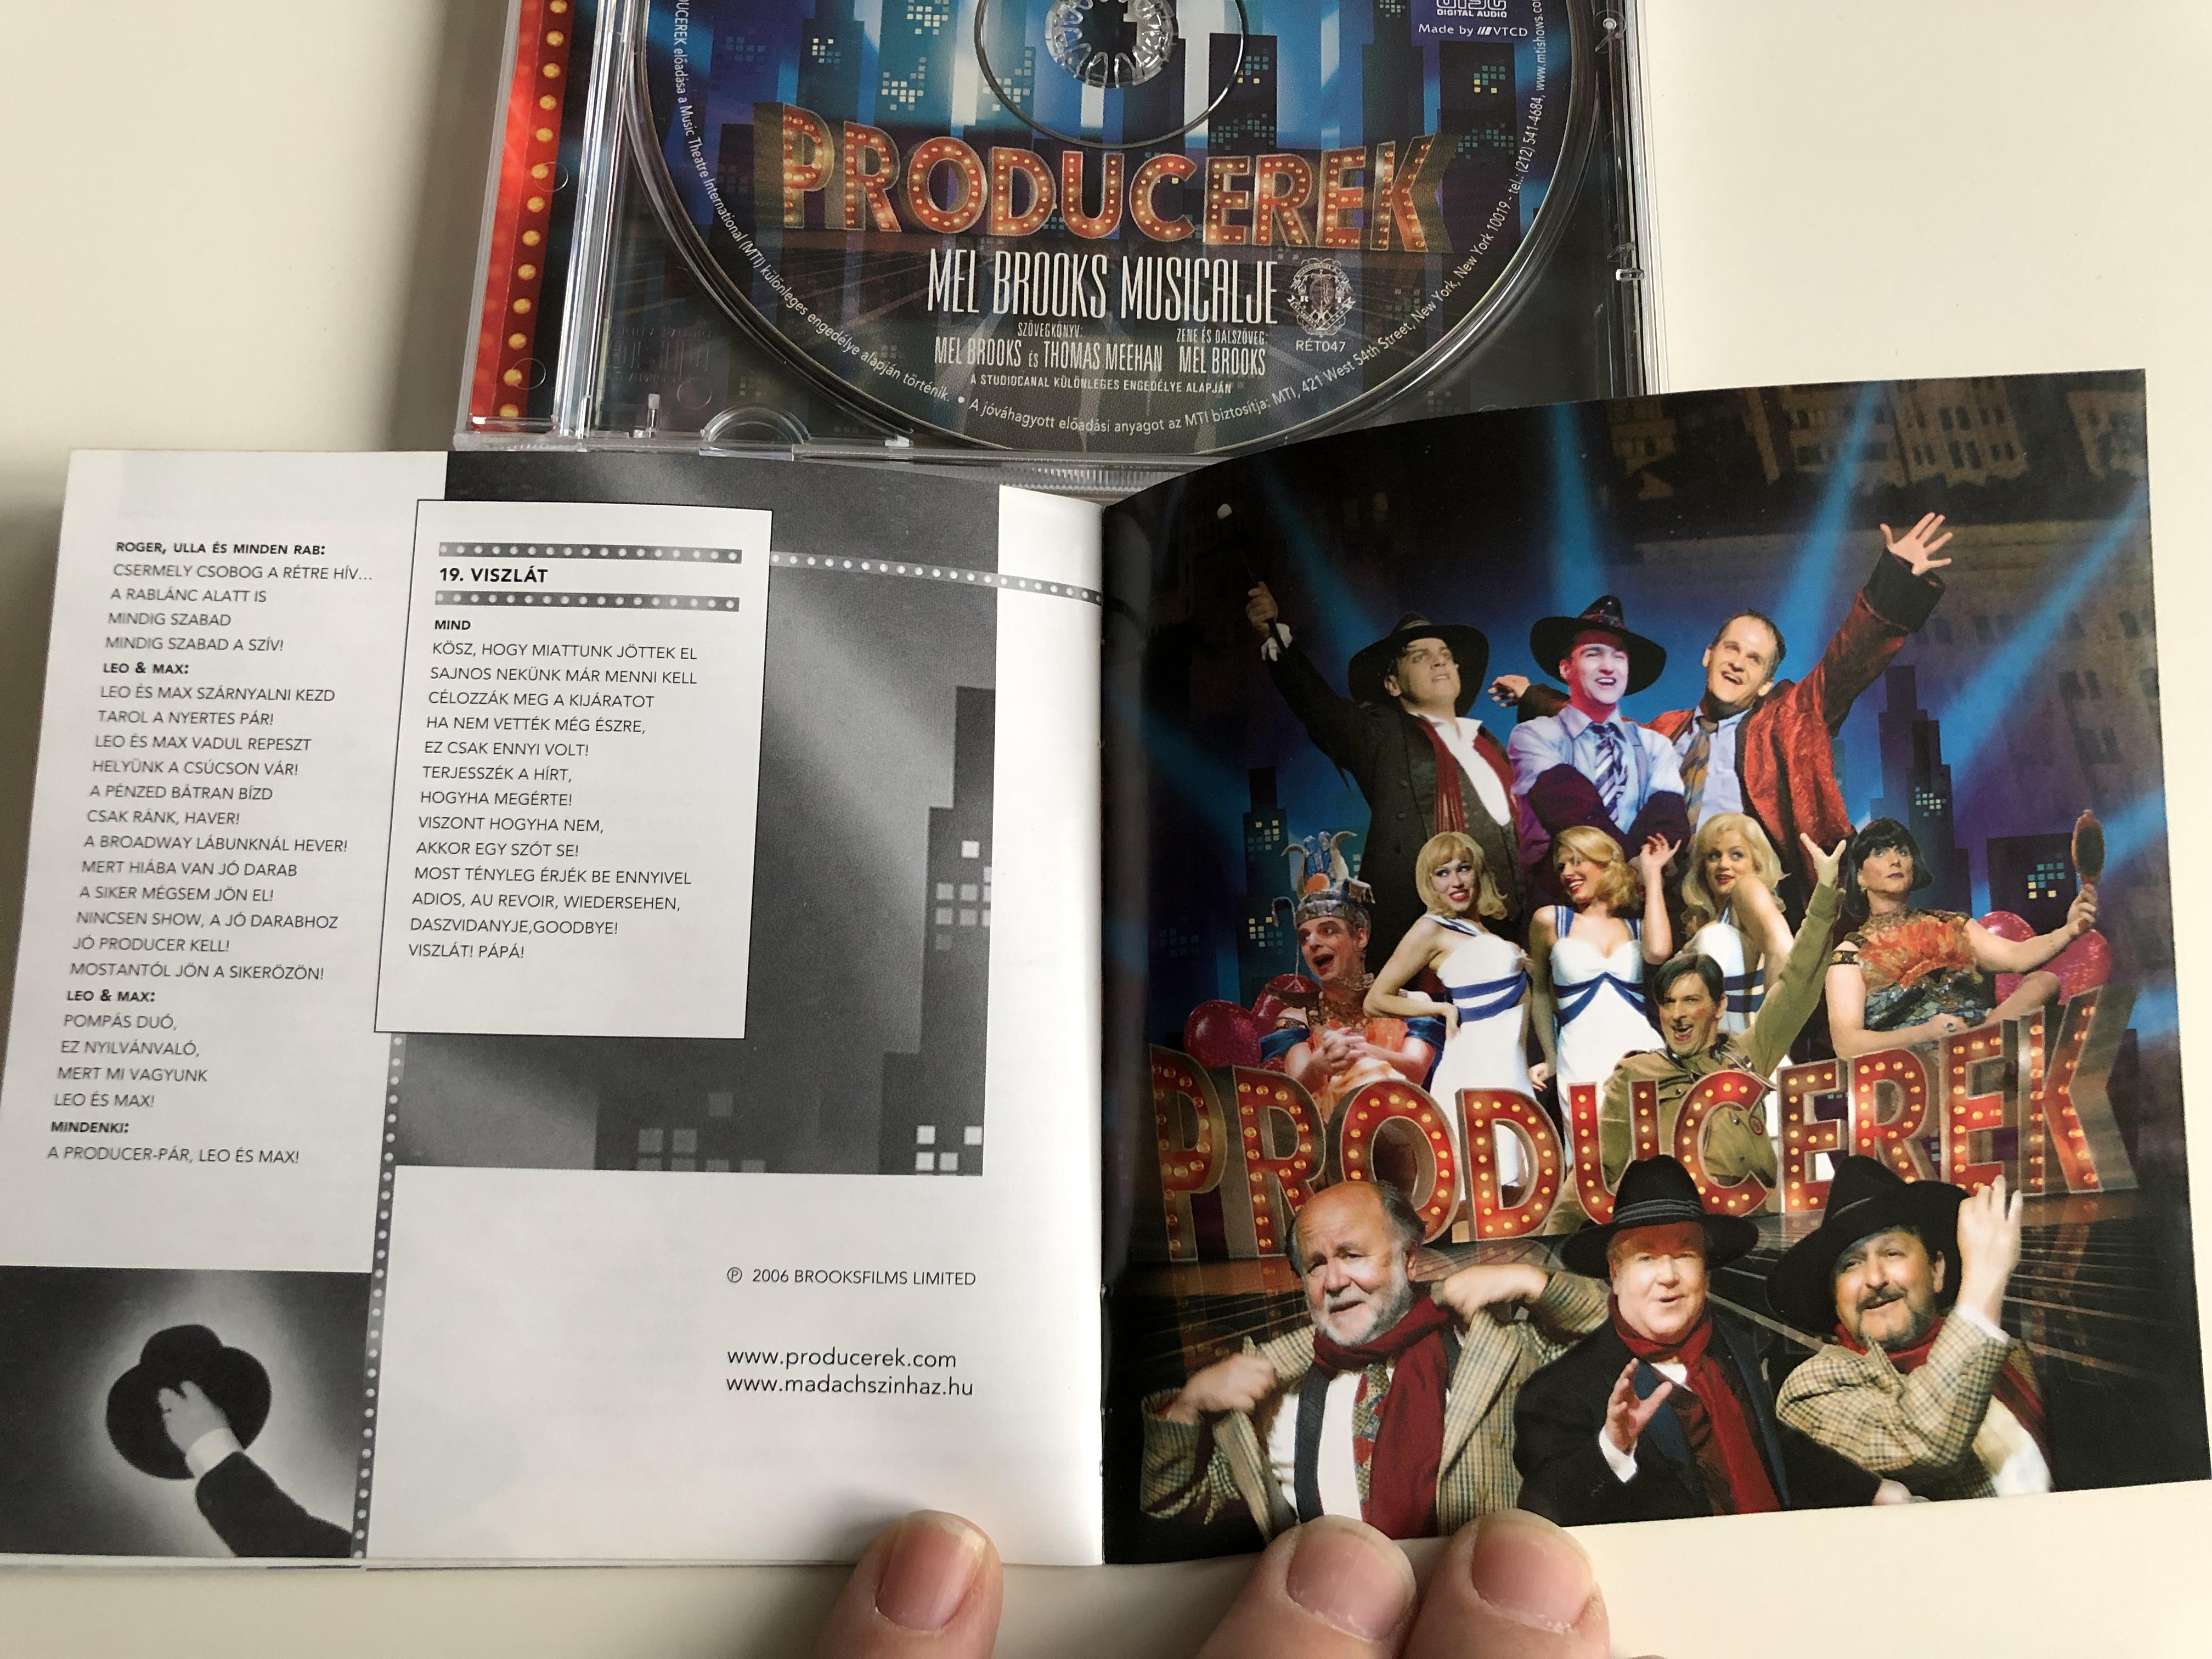 the-producers-audio-cd-2006-producerek-mel-brooks-musical-mad-ch-sz-nh-z-written-by-mel-brooks-thomas-meehan-conducted-by-kocs-k-tibor-10-.jpg